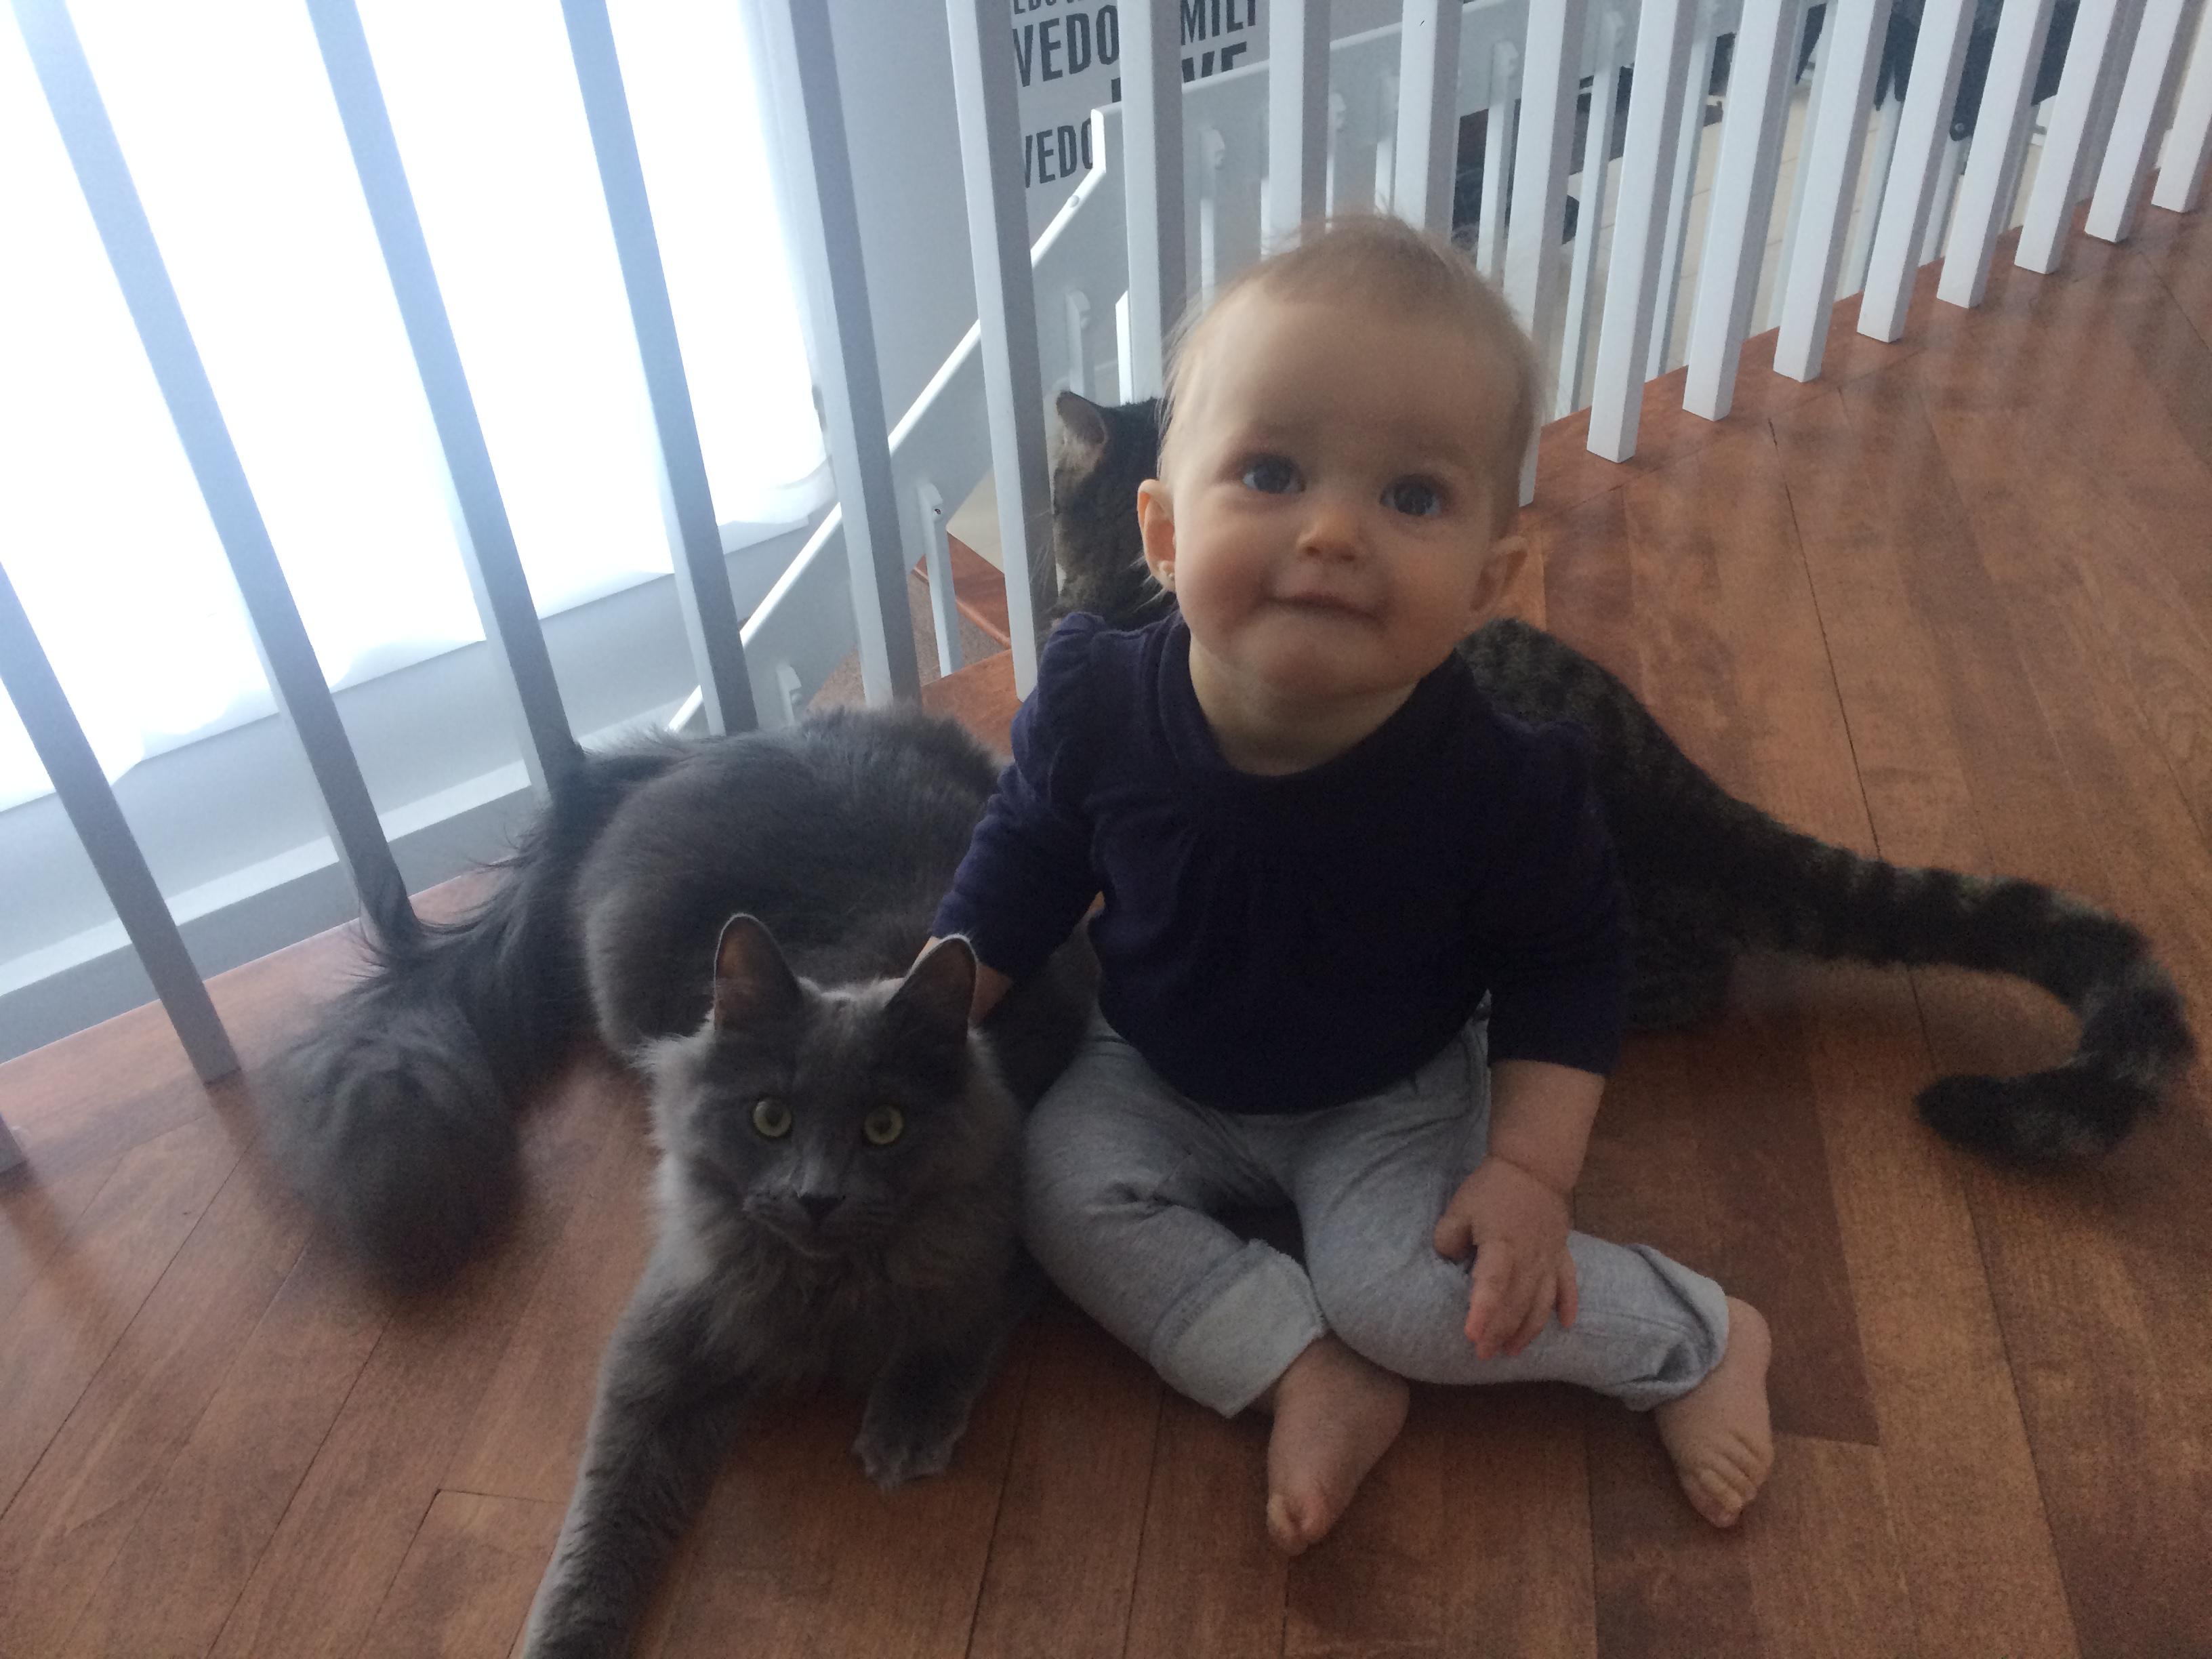 animaux compagnie chat enfant harmonie